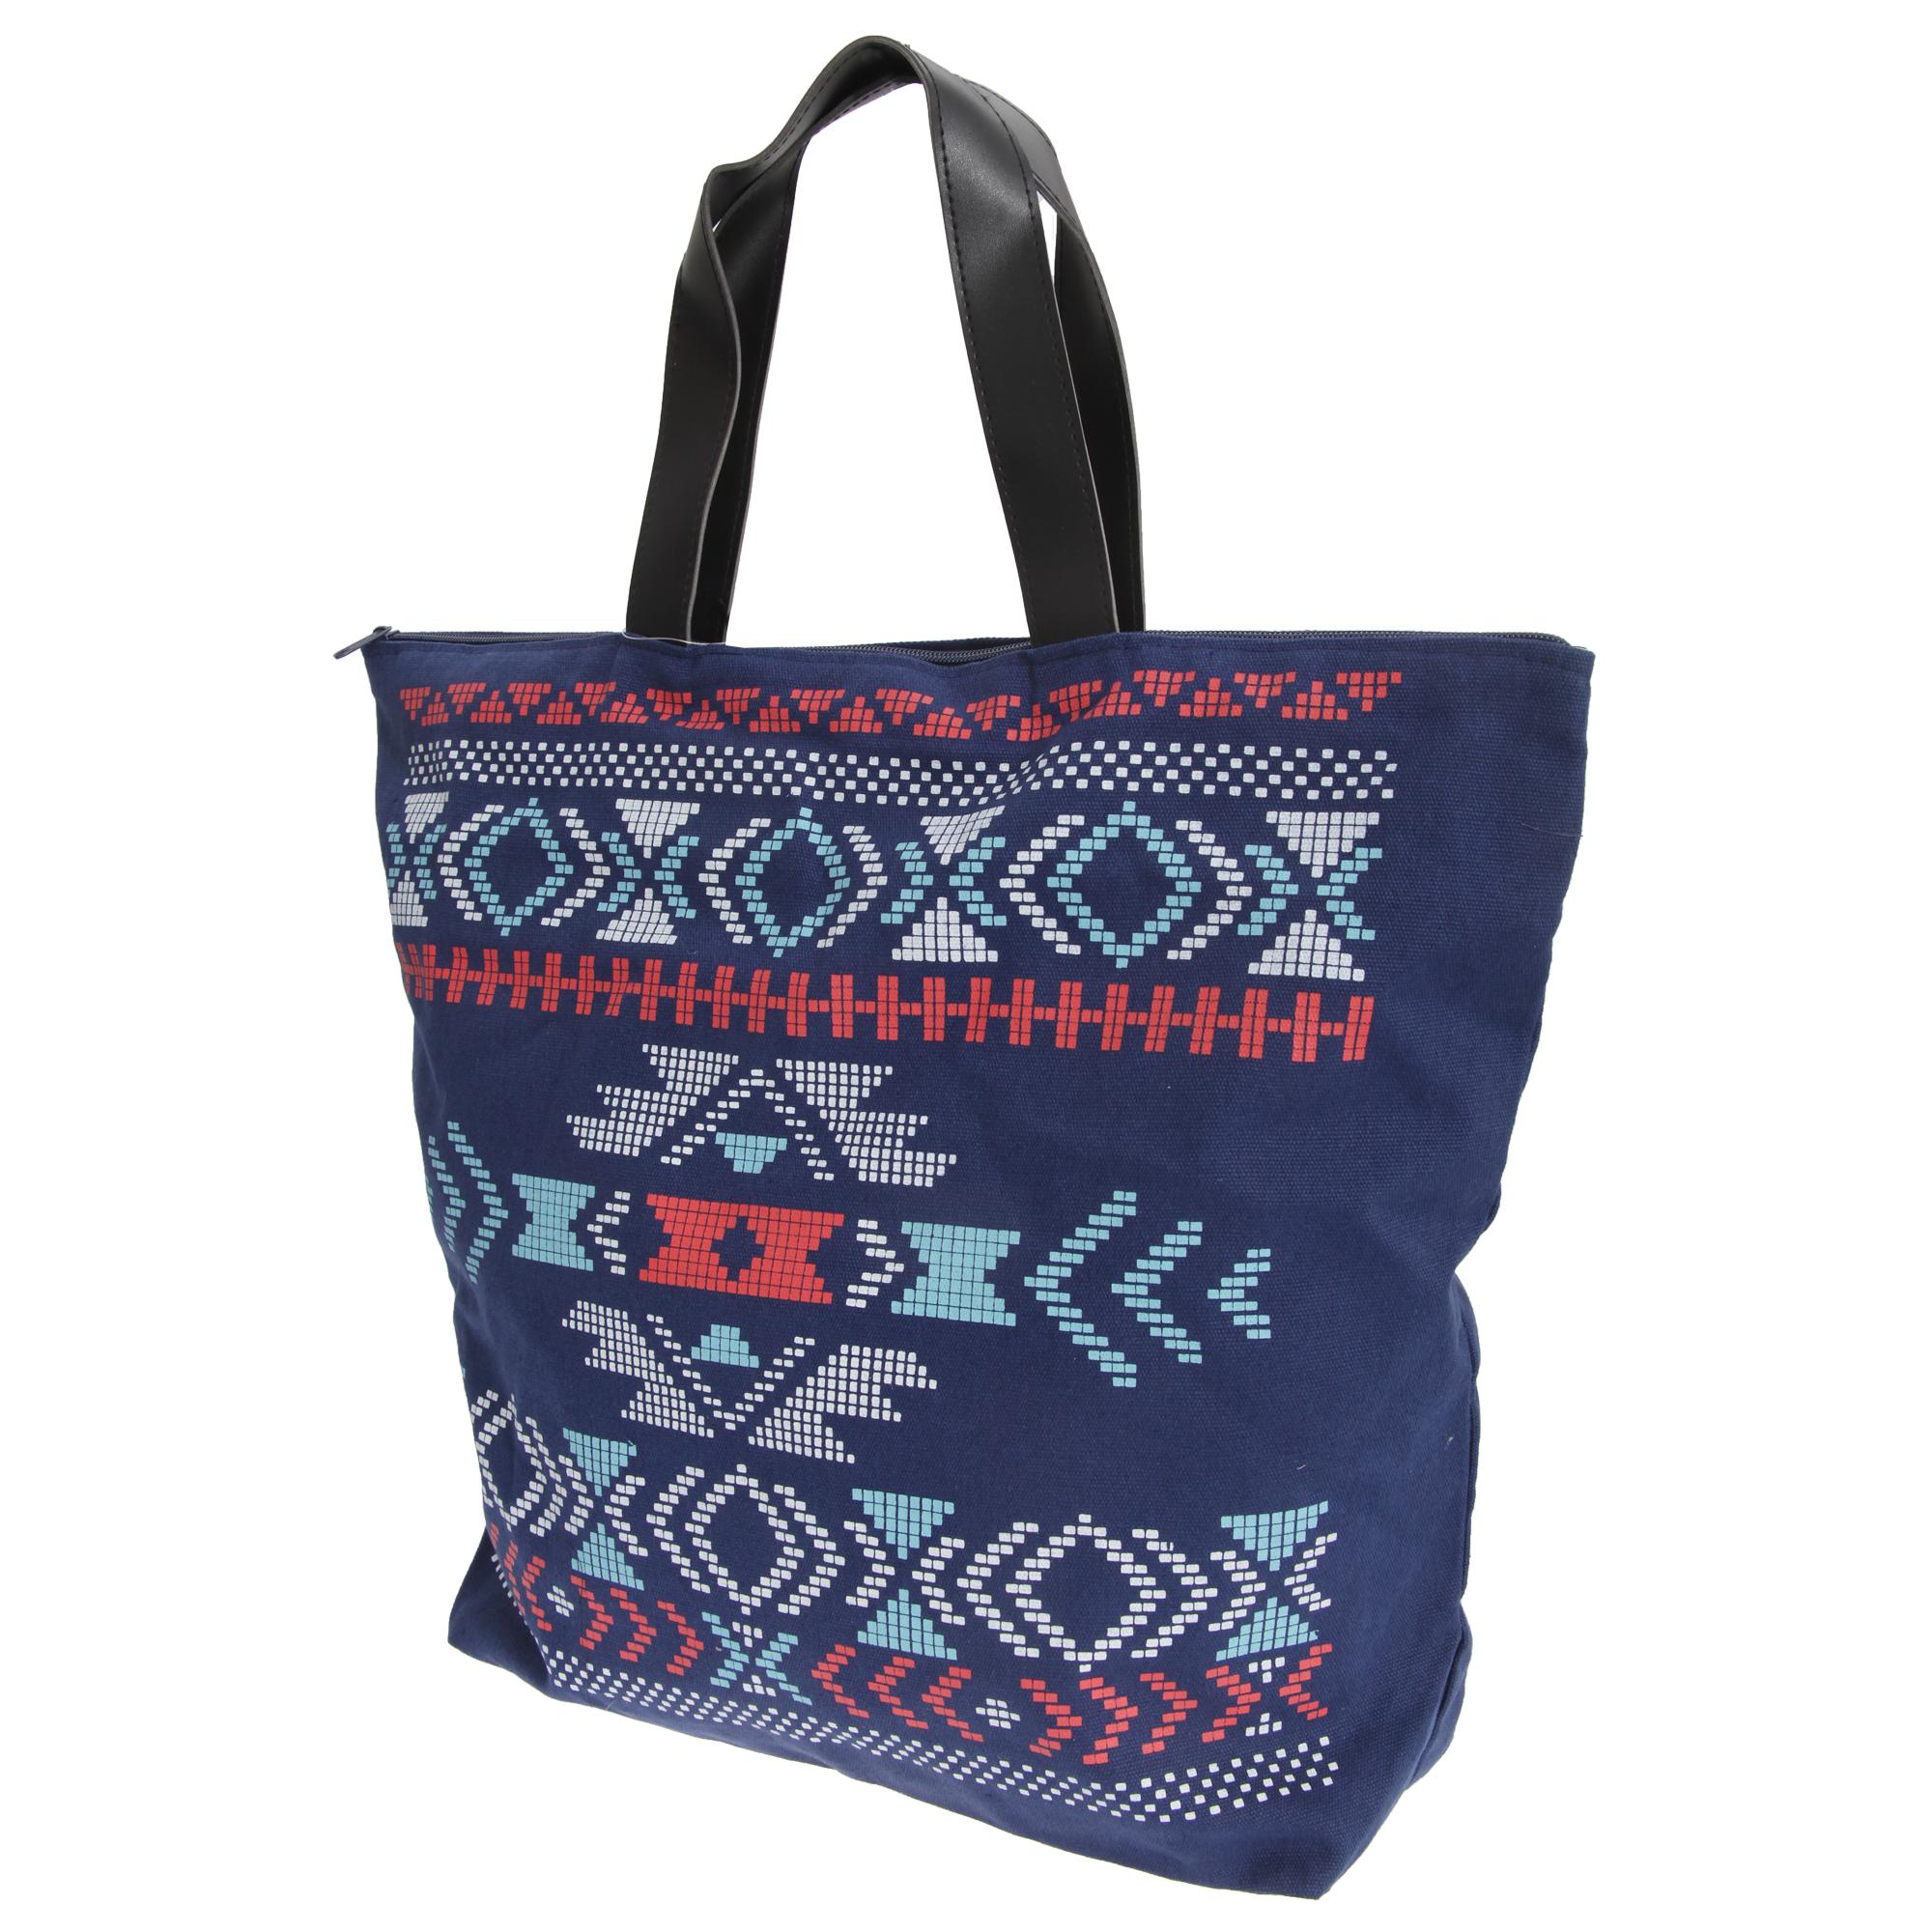 FLOSO Womens/Ladies Cotton Rich Aztec Print Top Handle Handbag (One Size) (Navy)